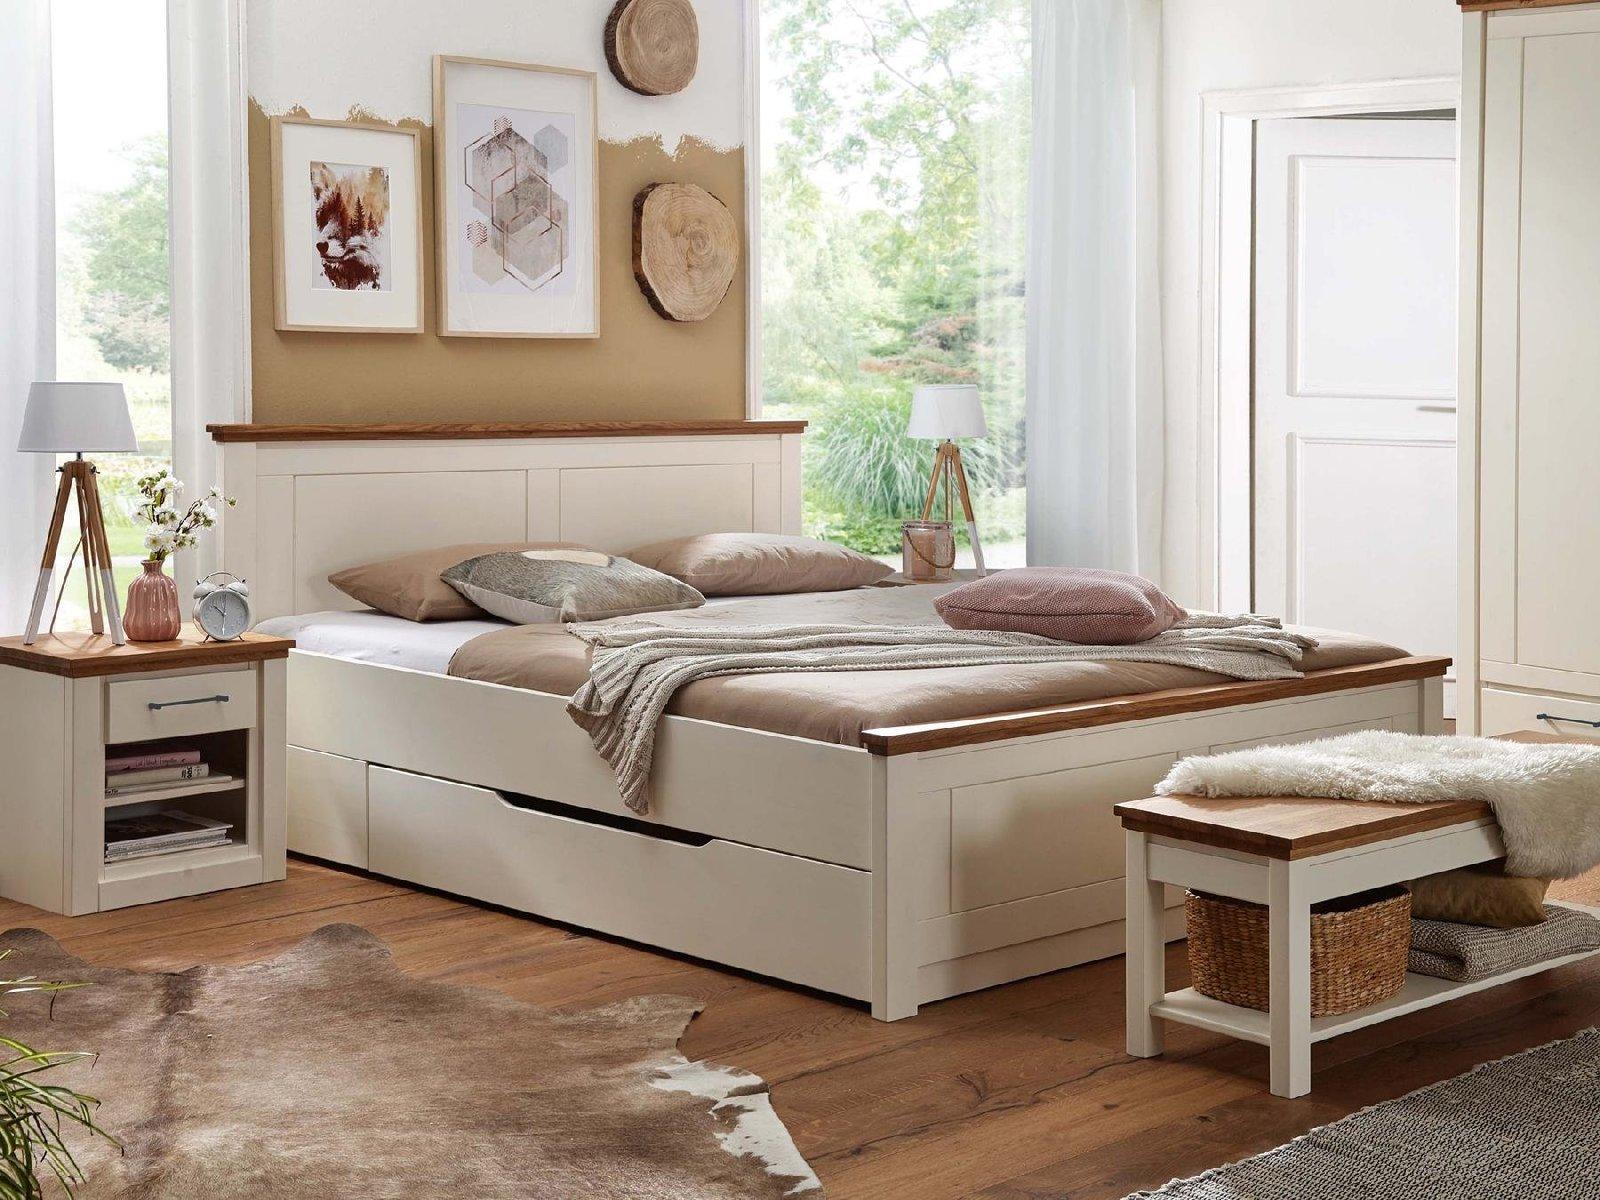 Massivholz Schlafzimmer Kiefer Blavand, Bild 2